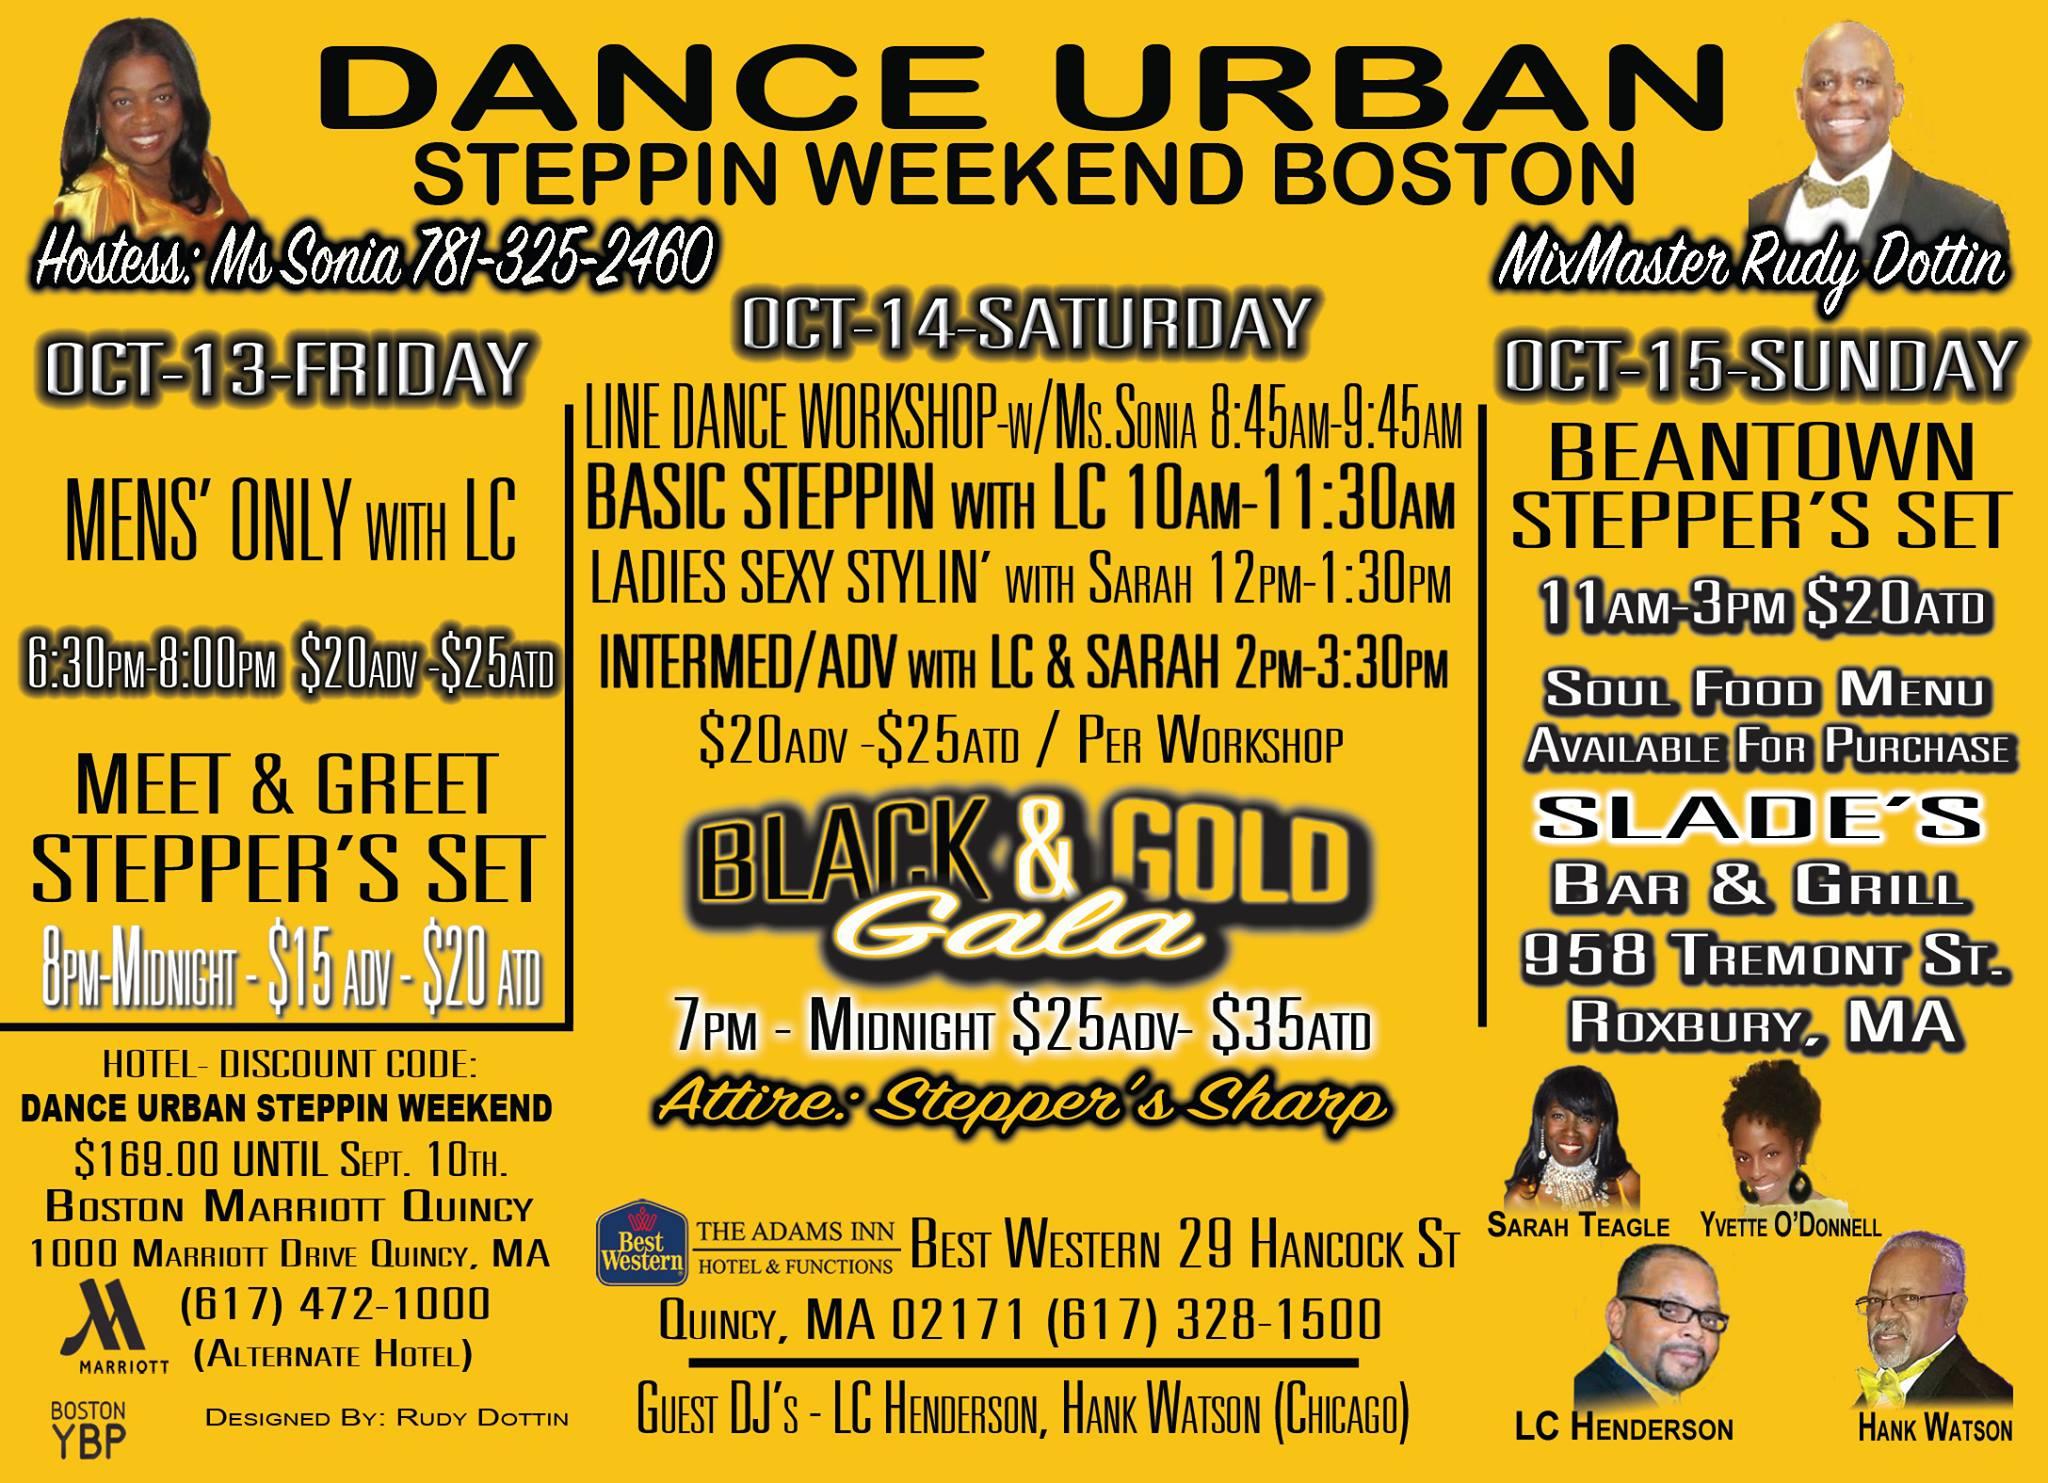 Dance Urban Steppin Weekend Boston 2017 agenda